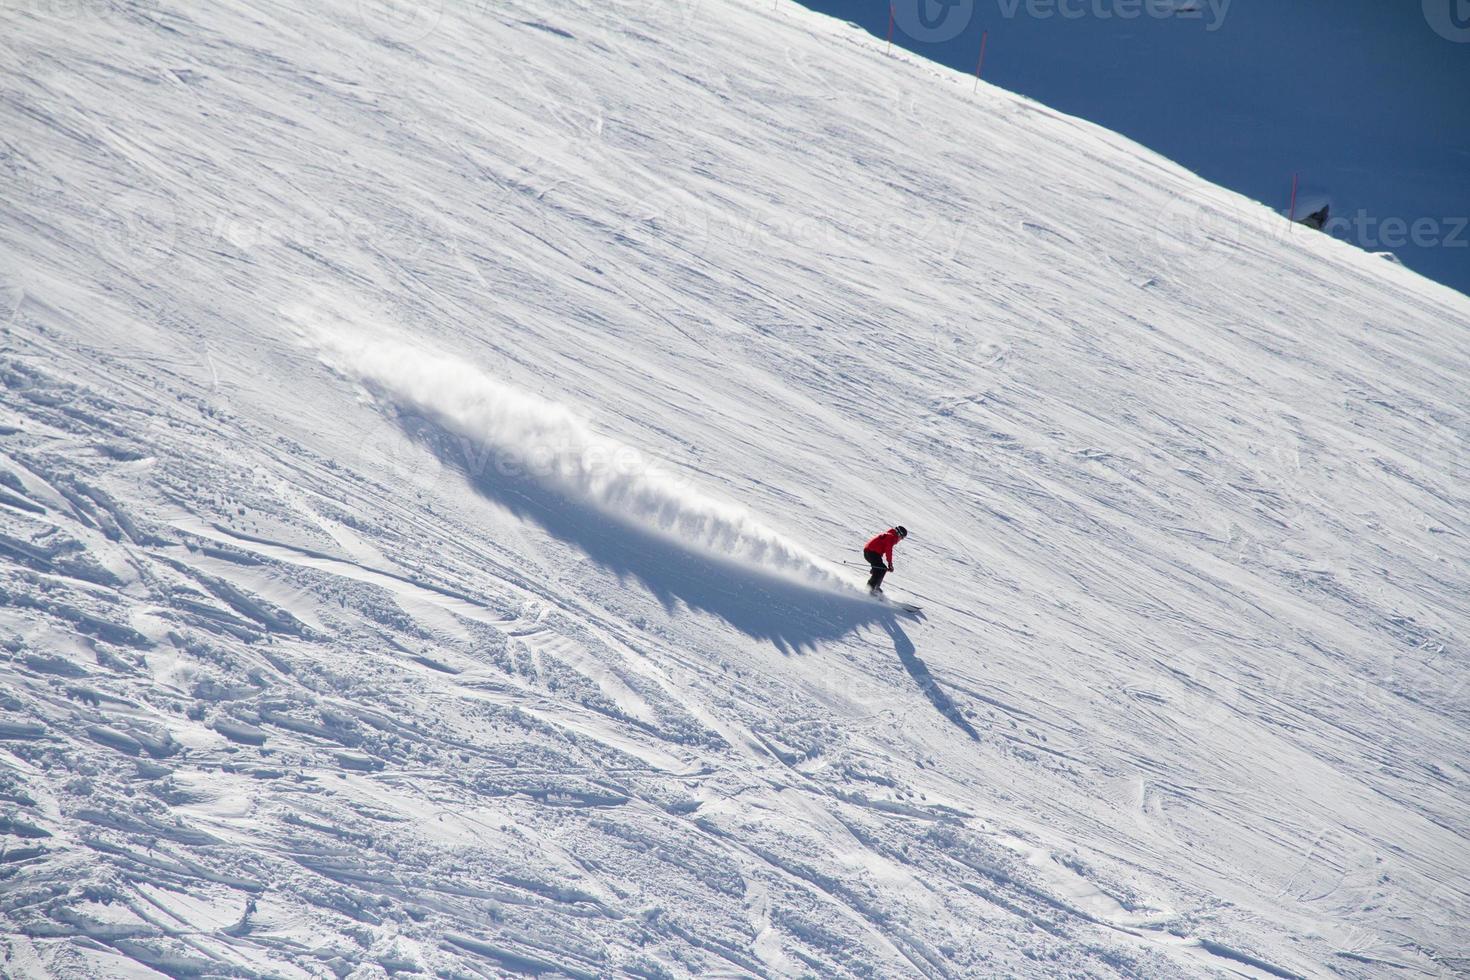 Skier going down the slope at ski resort. photo